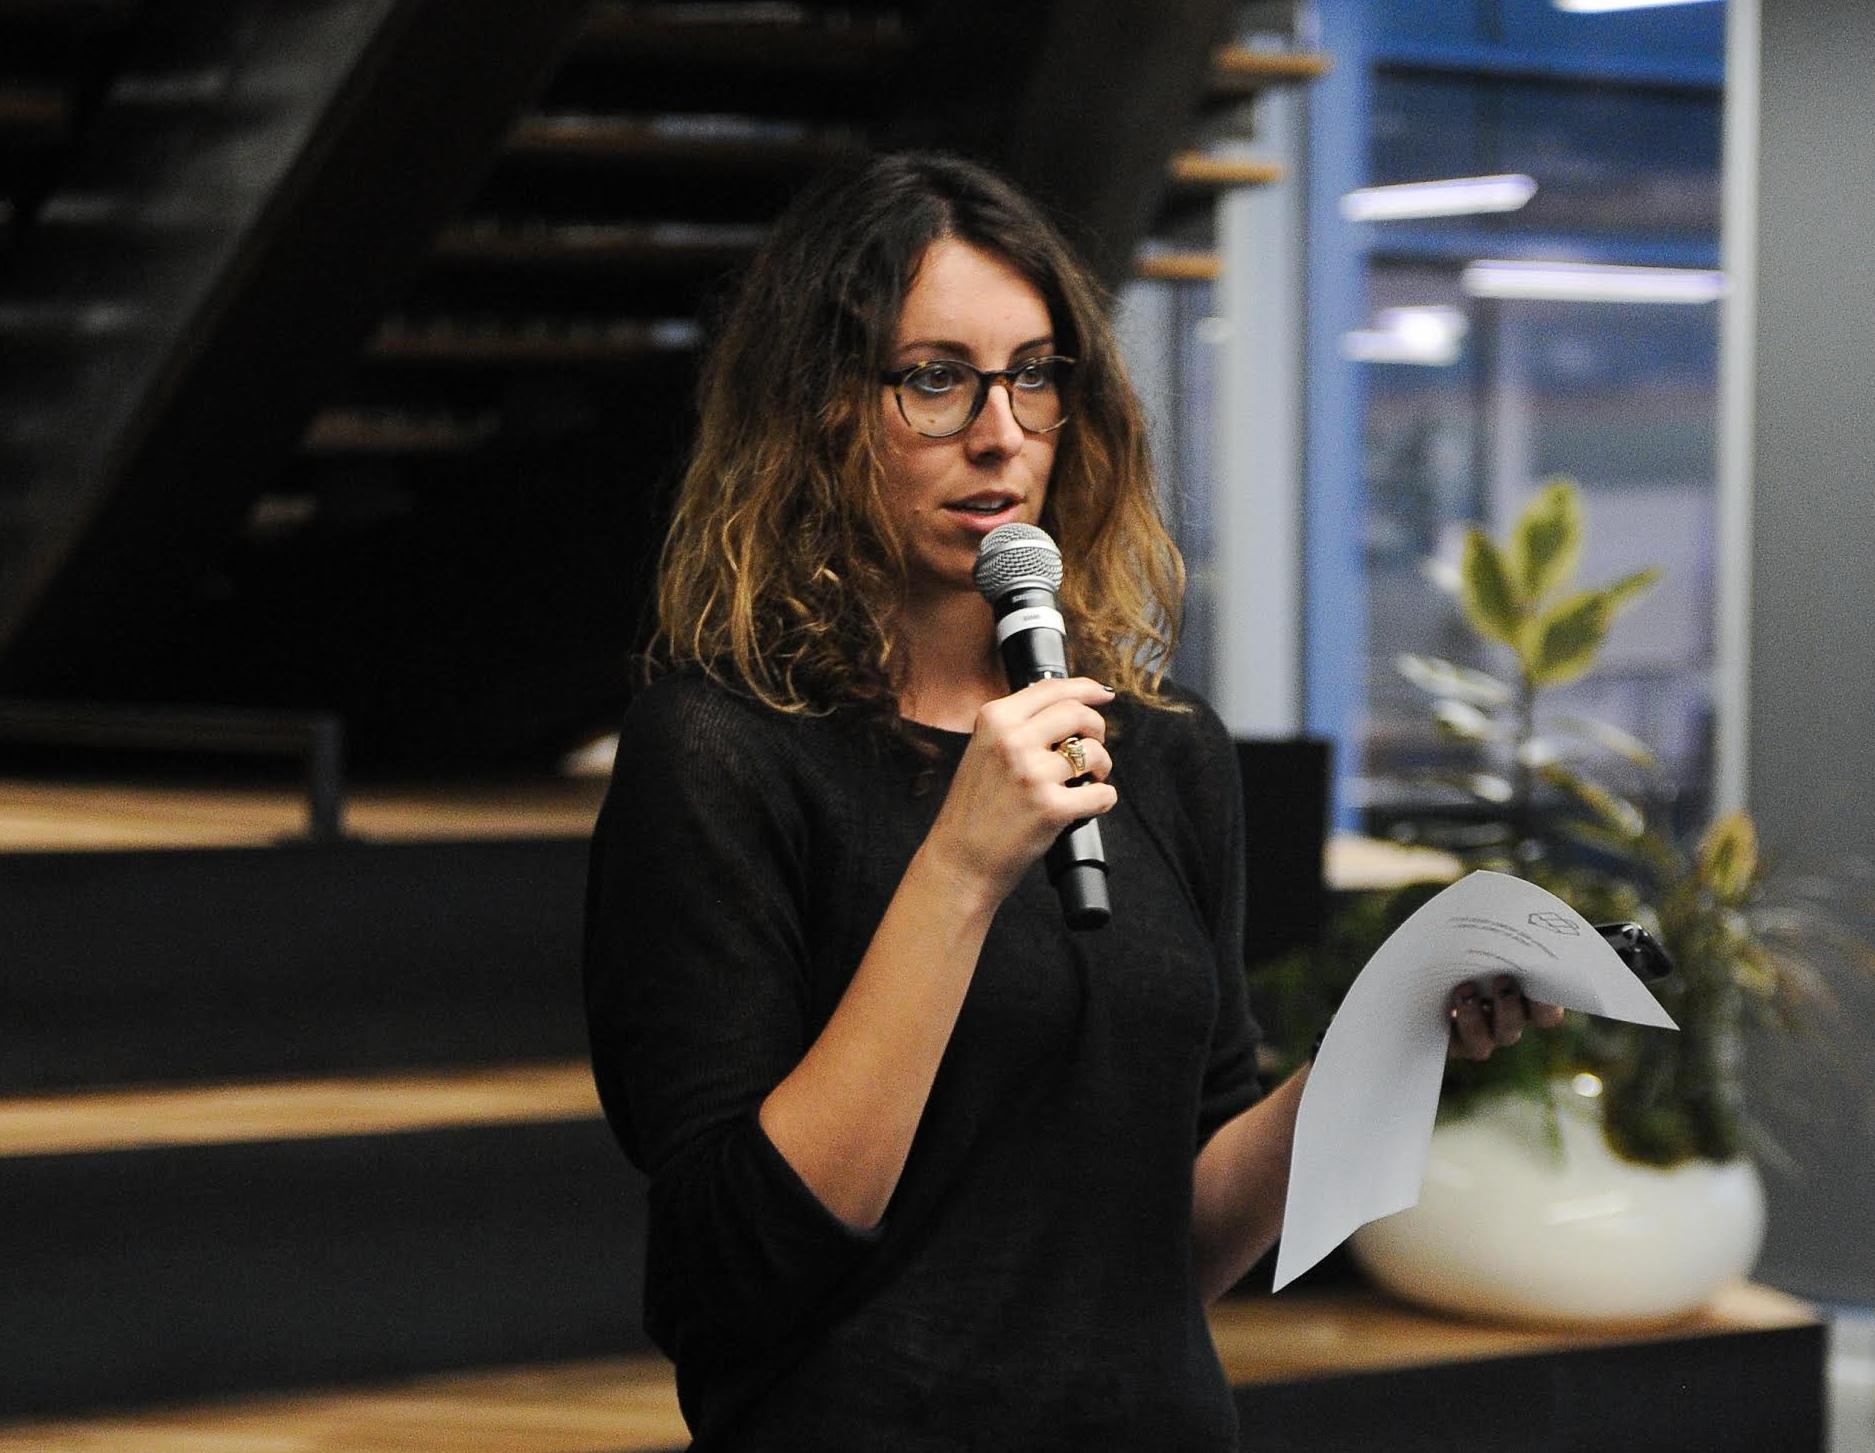 Ashland Viscosi built her business, Creatives Meets Business.